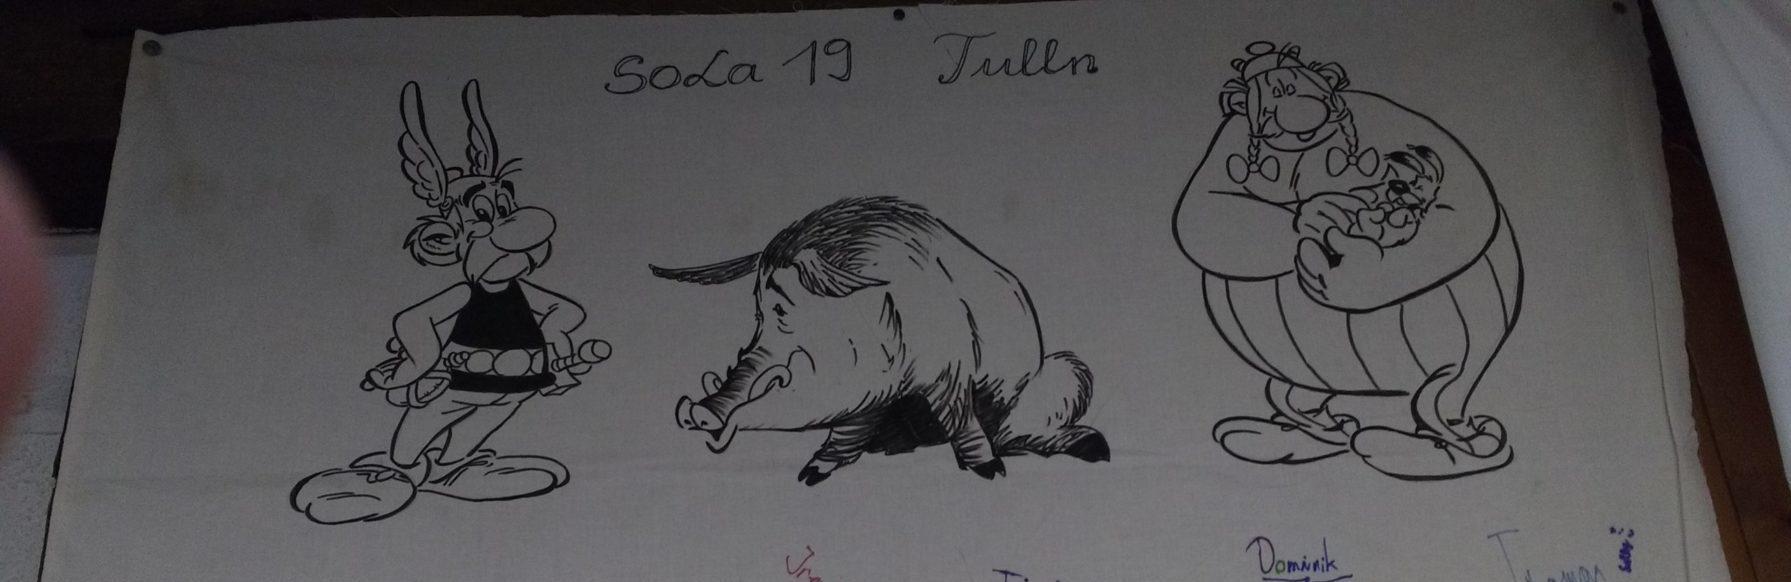 Sola2019 382